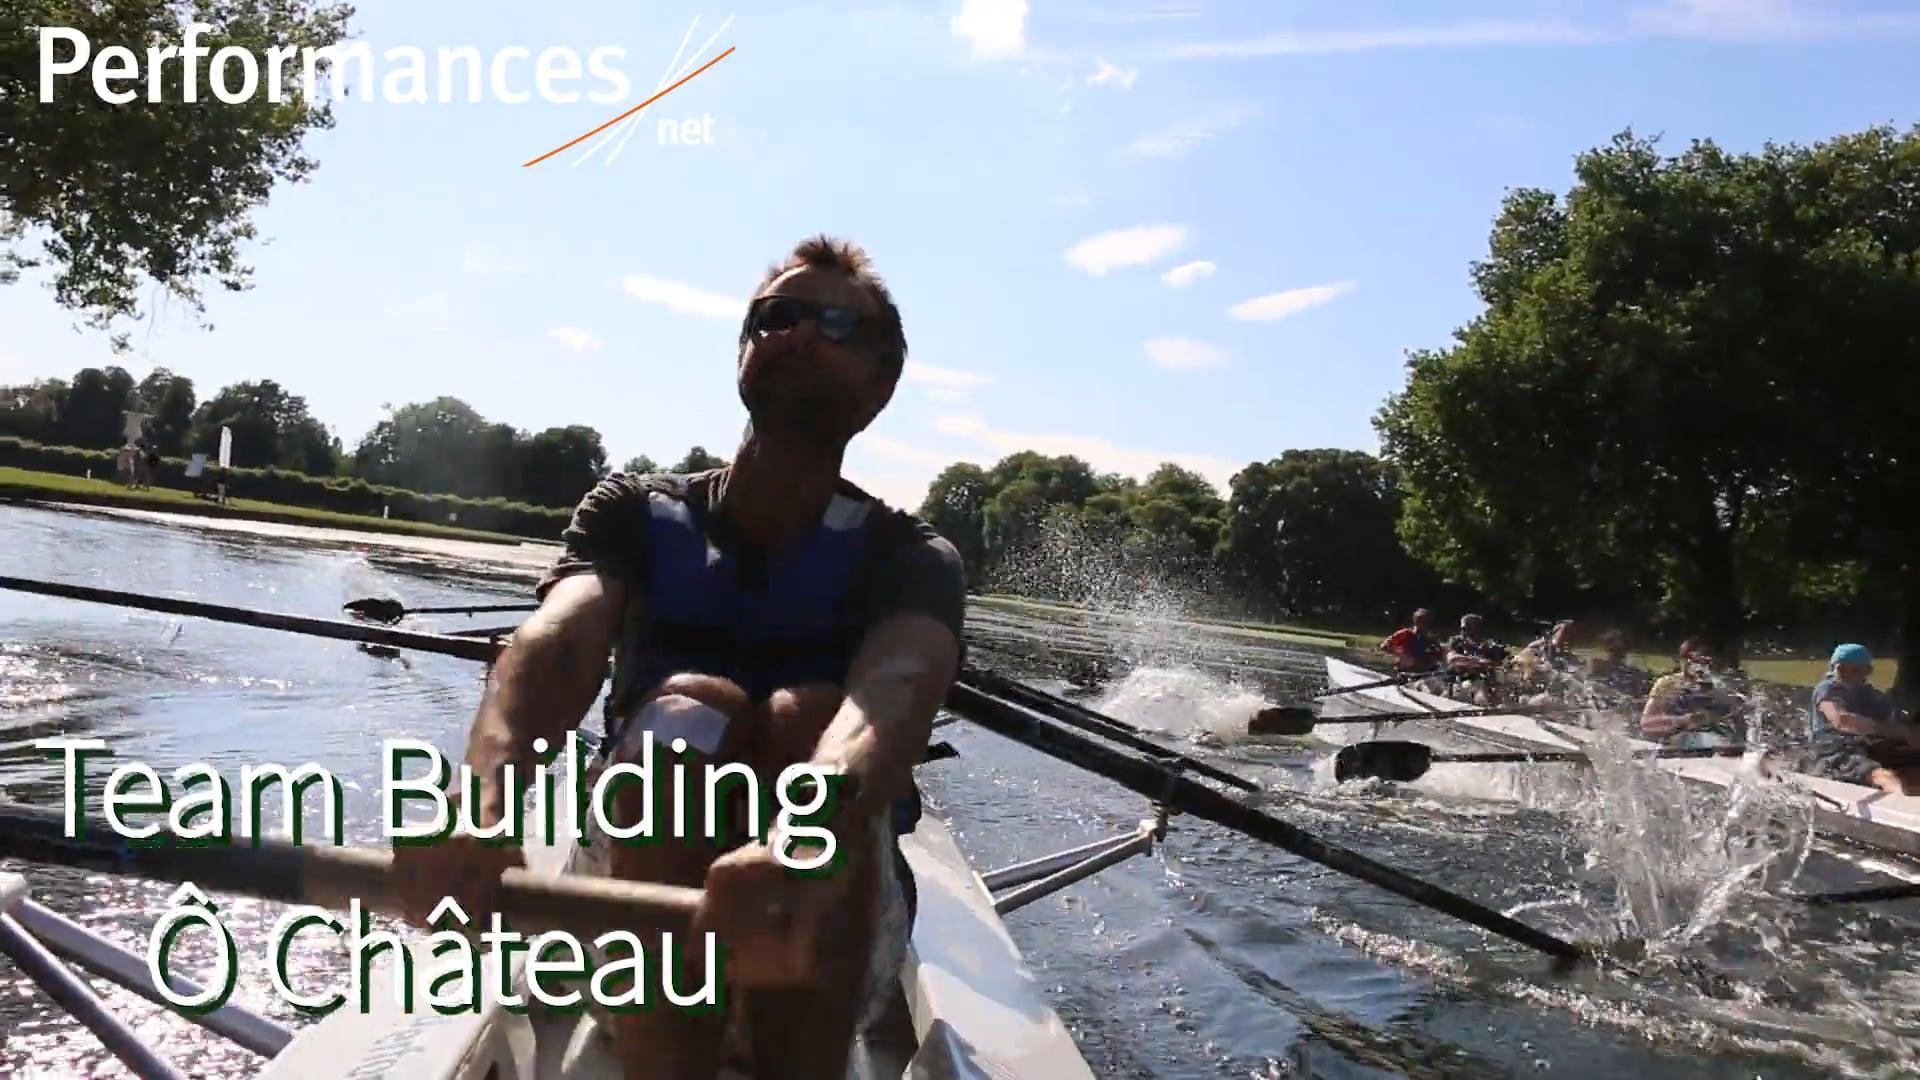 Team building aviron Ile de France